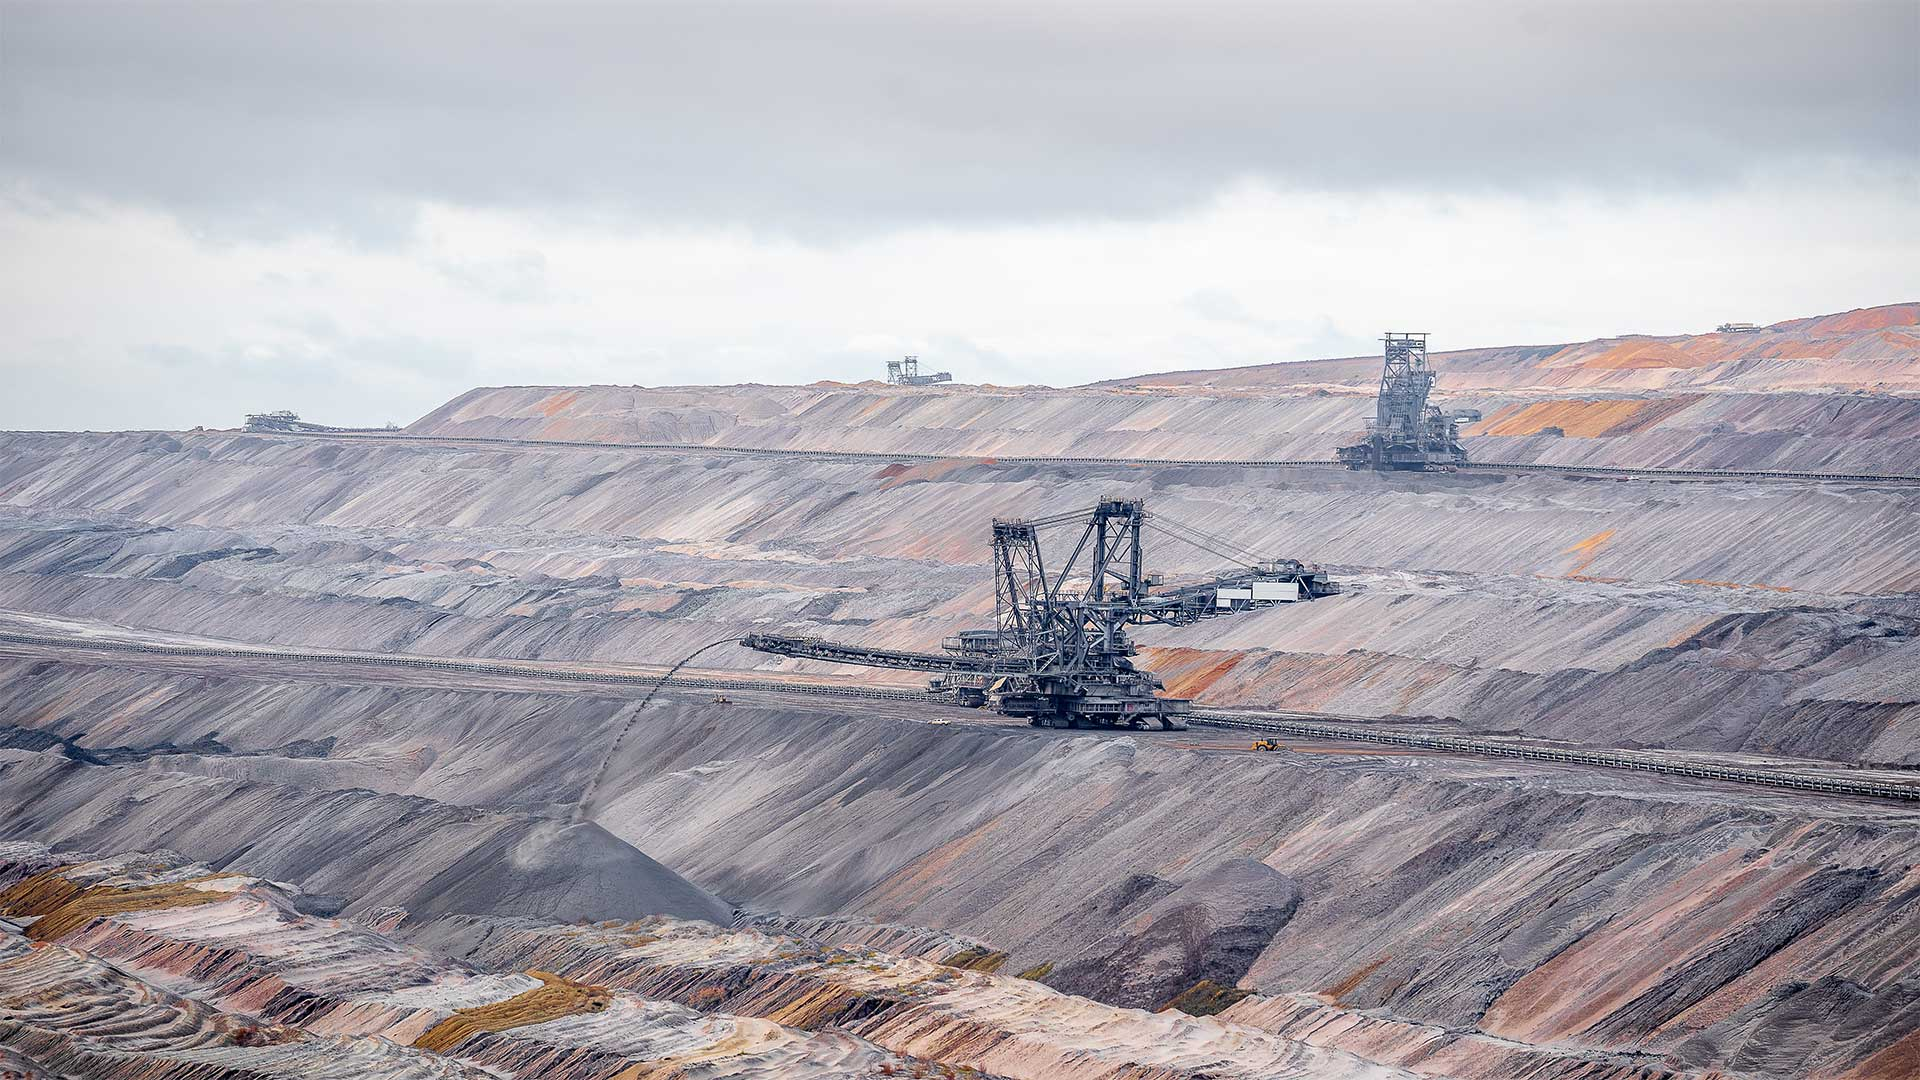 Mining Boron – Sources And Major Boron Producers